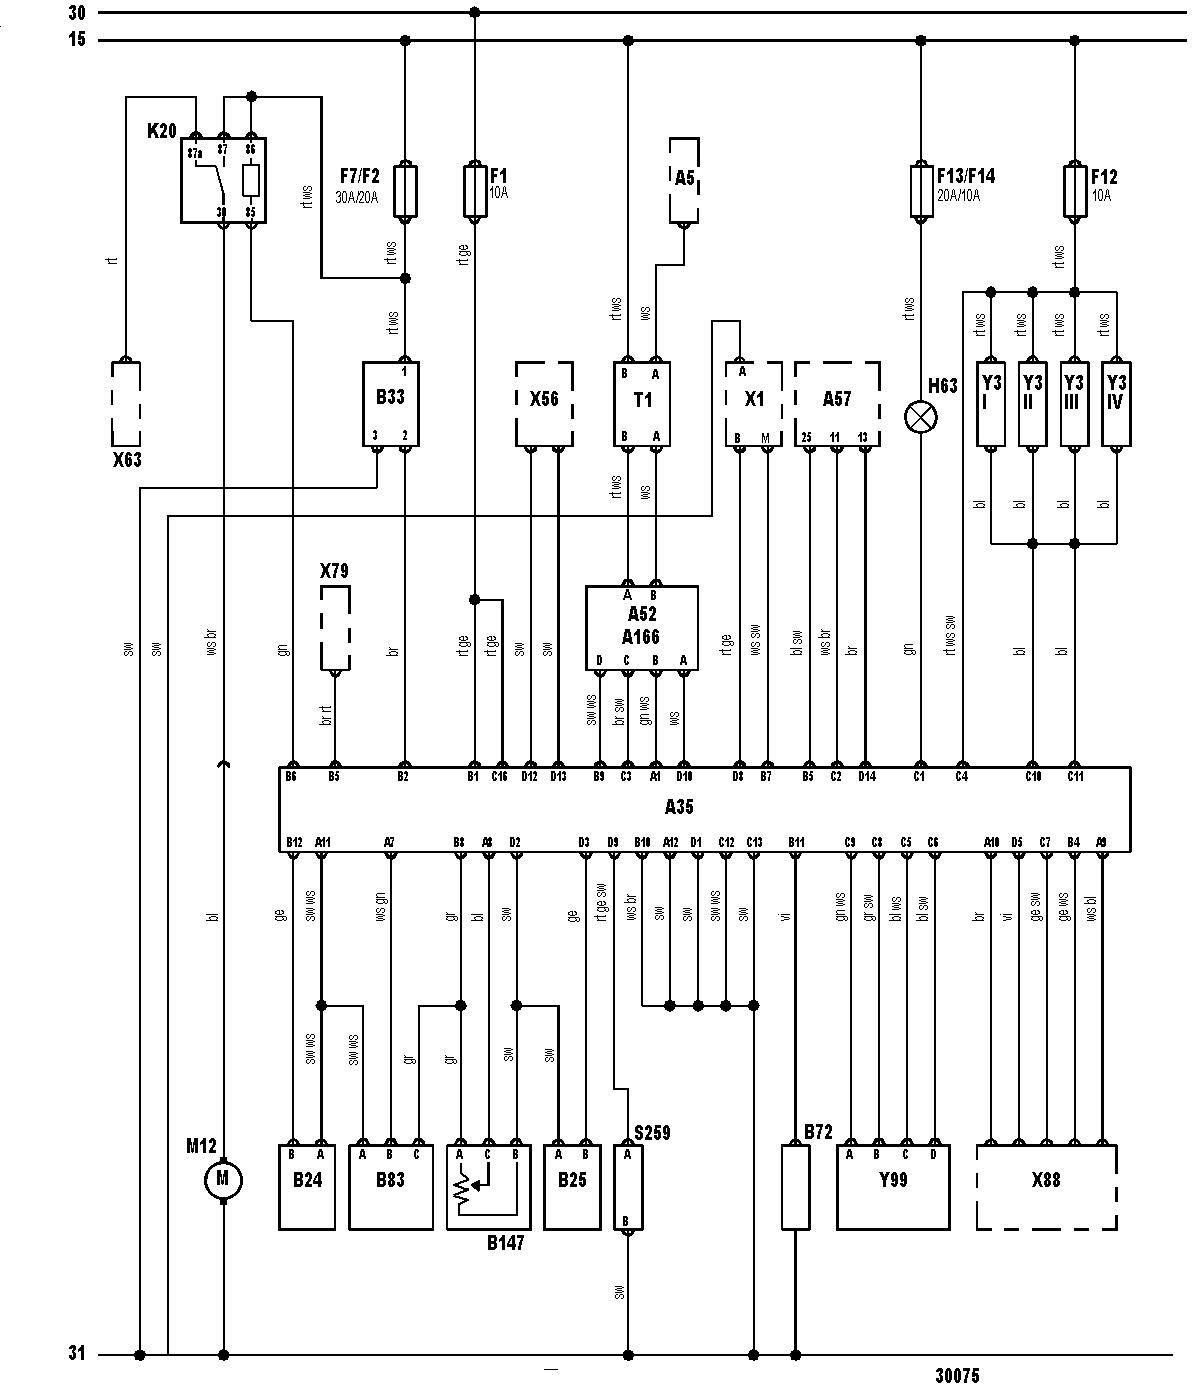 generac automatic transfer switch wiring diagram wiring diagram generac automatic transfer switch wiring diagram ewiring